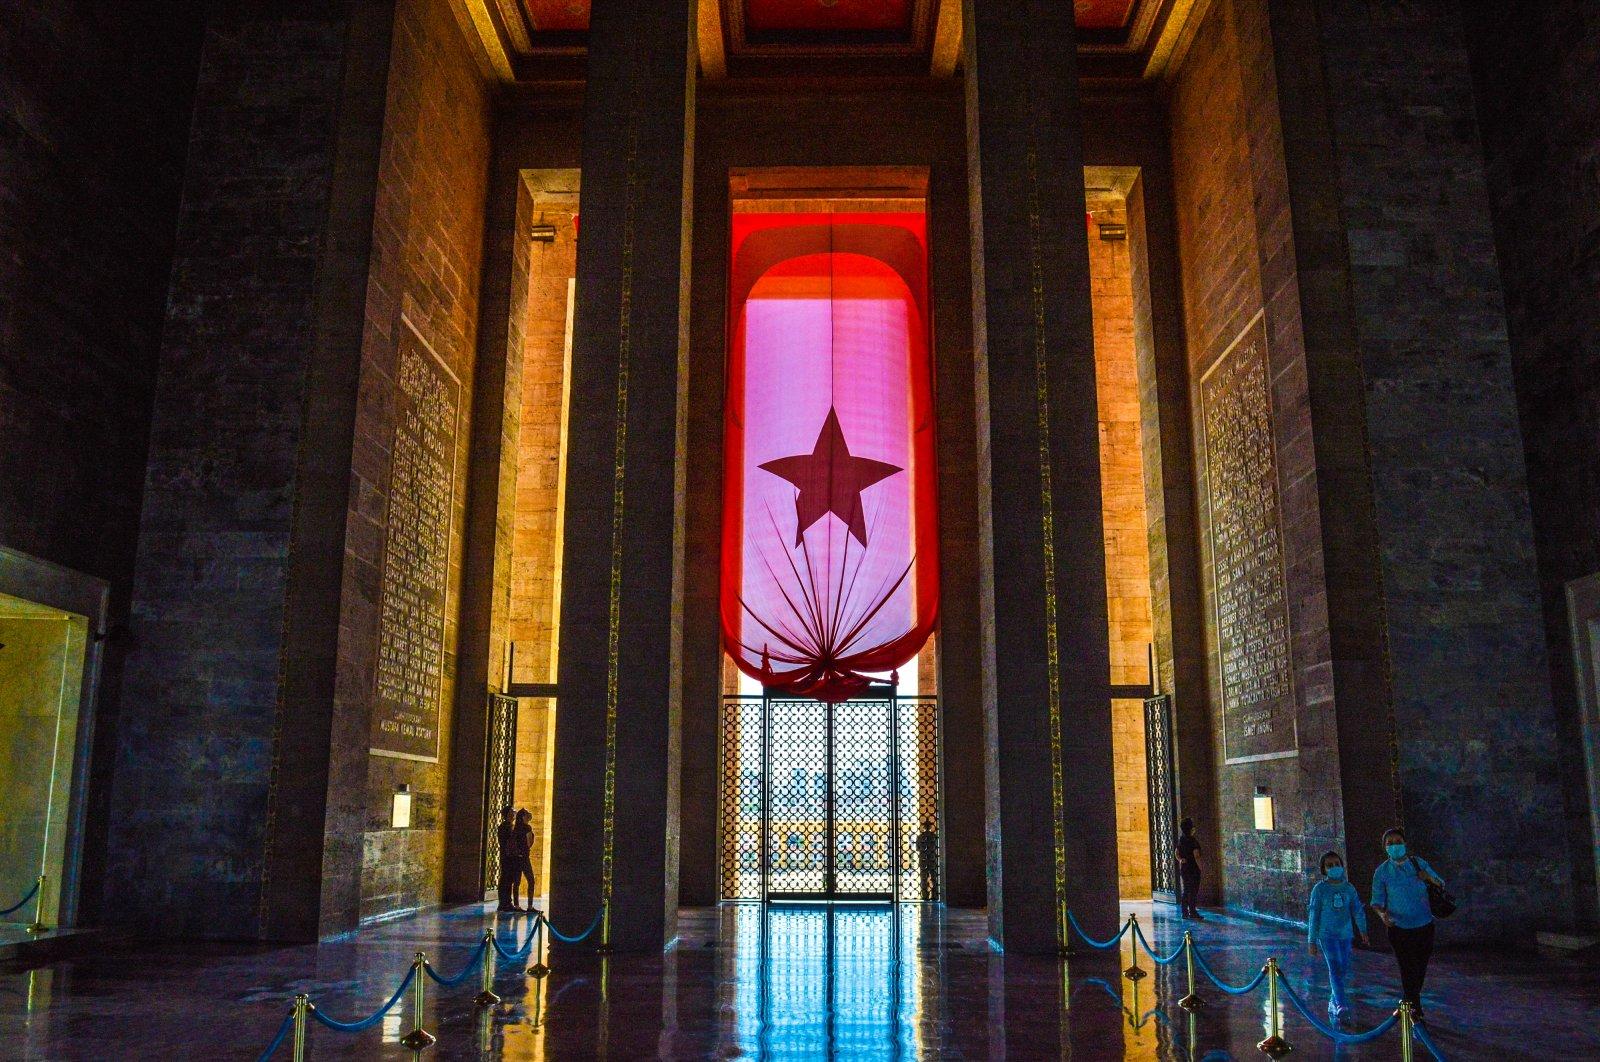 People wearing protective face masks walk past a giant Turkish national flag at Anıtkabir, the mausoleum of modern Turkey's founder Mustafa Kemal Atatürk, in Ankara, Turkey, Oct. 13, 2021. (Photo by Getty Images)